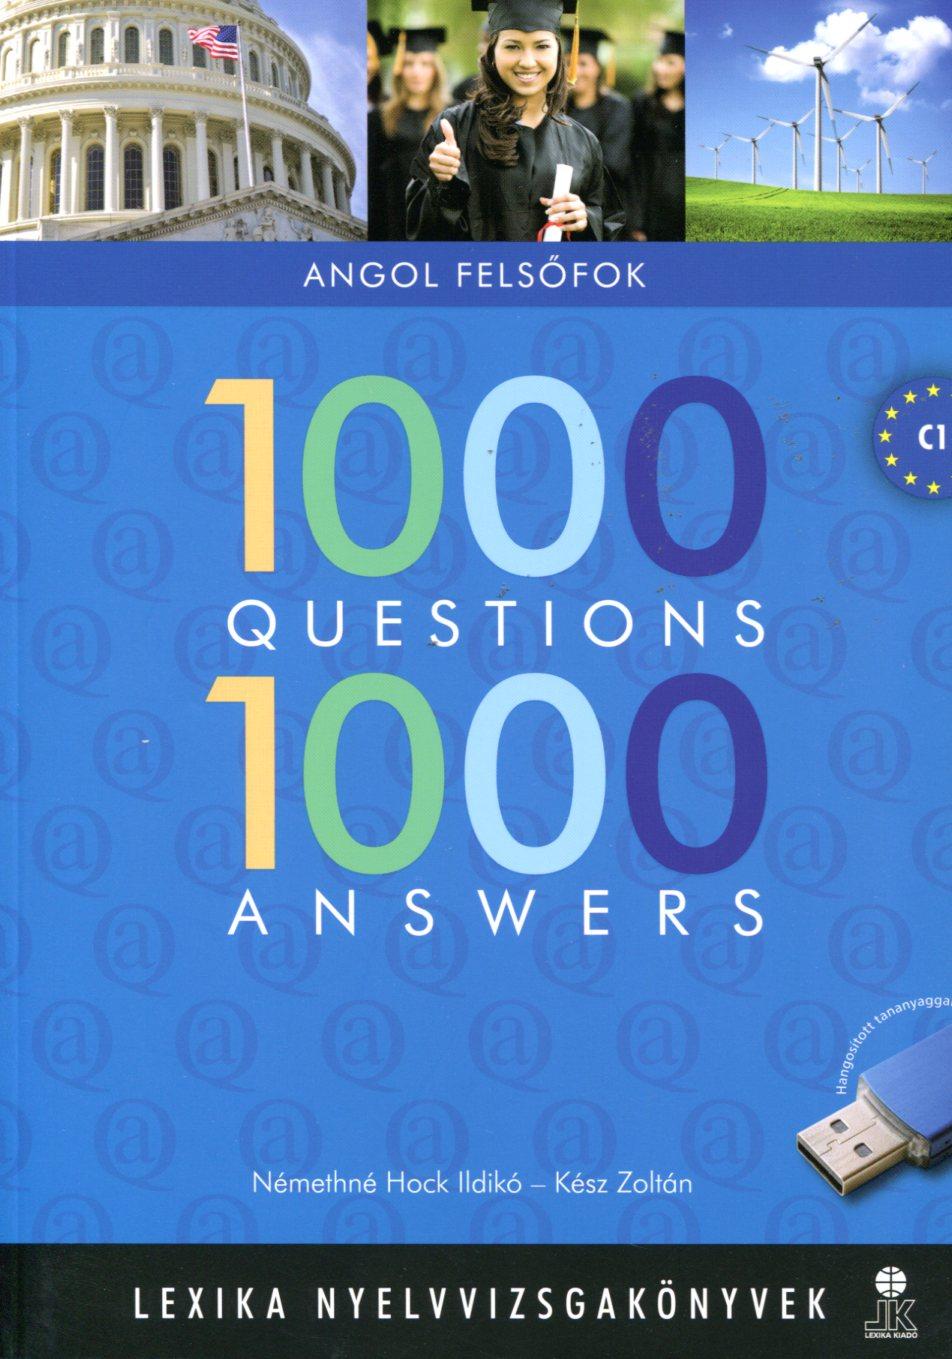 1000 QUESTIONS 1000 ANSWERS FELSŐFOK